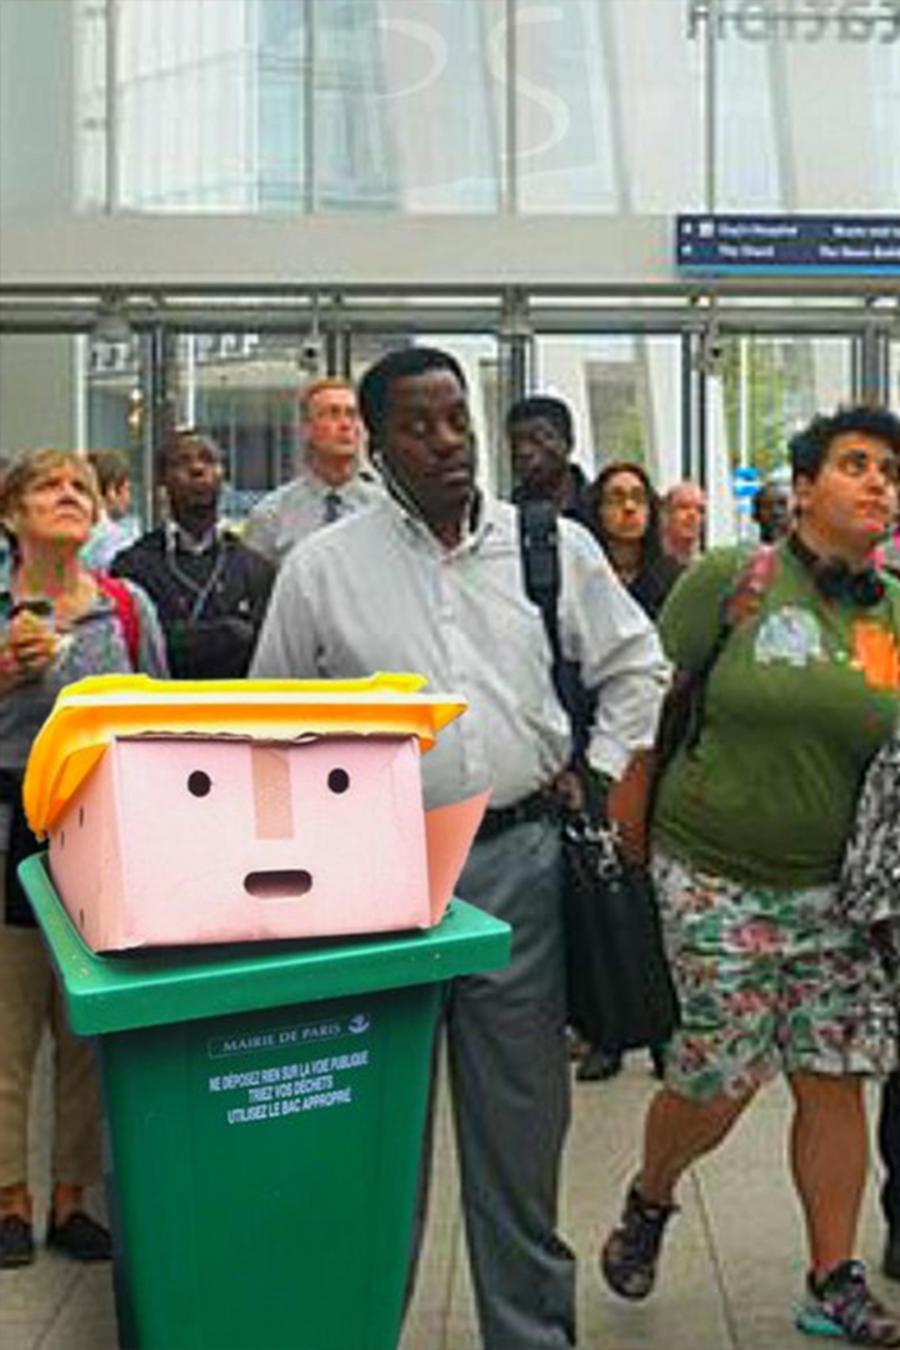 Donald the Bin esperando el tren en Londres.